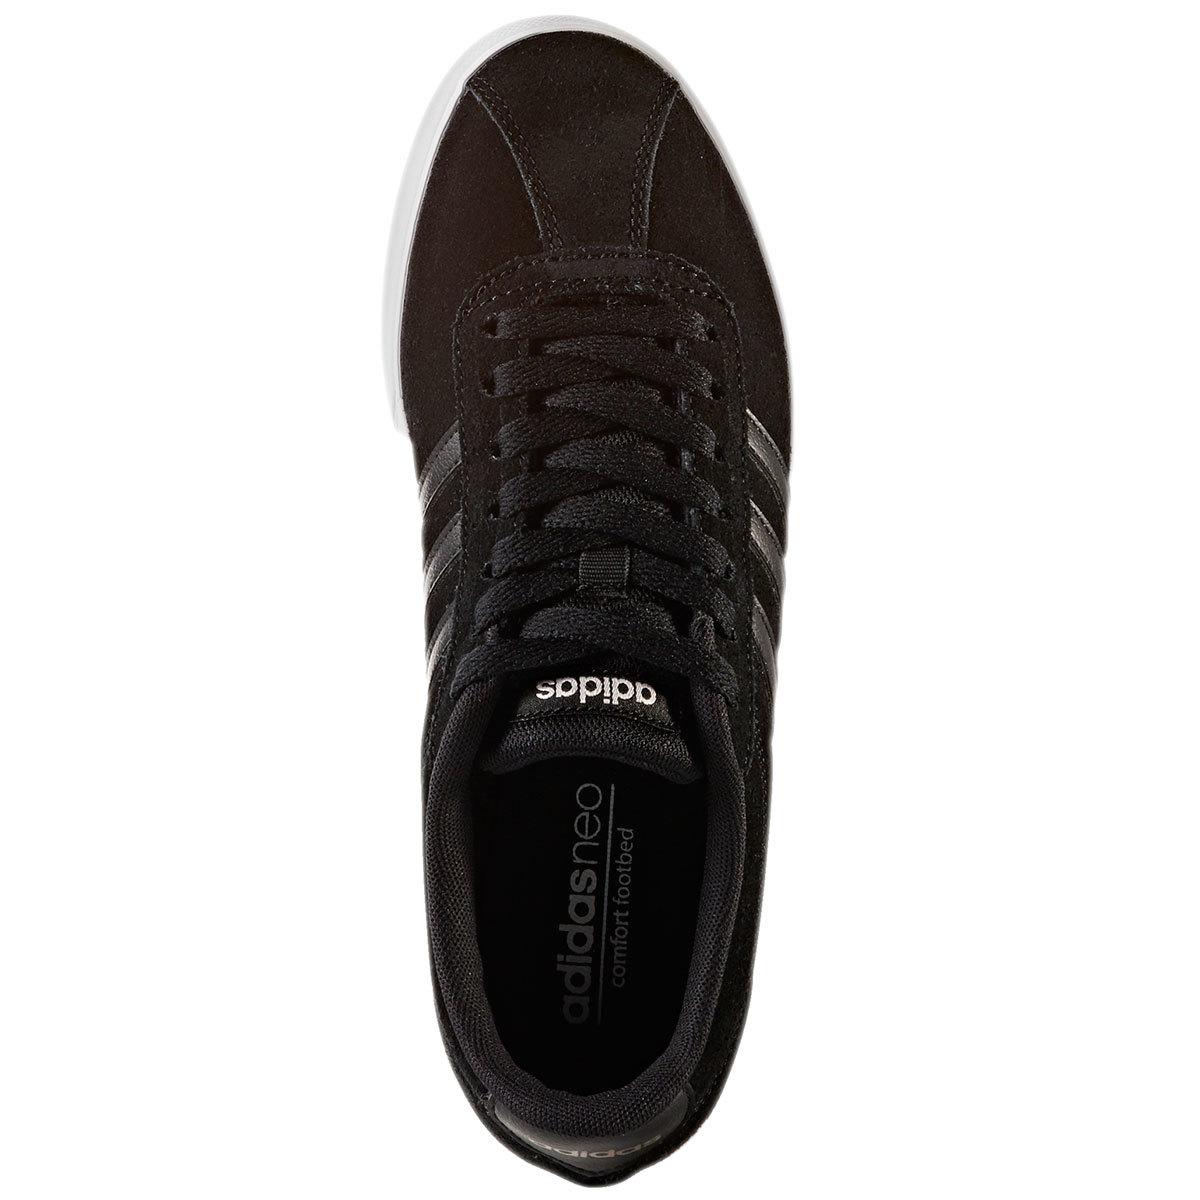 SneakersBlackMetallic Bob's Women's Courtset Neo ADIDAS XPkZlOiwTu